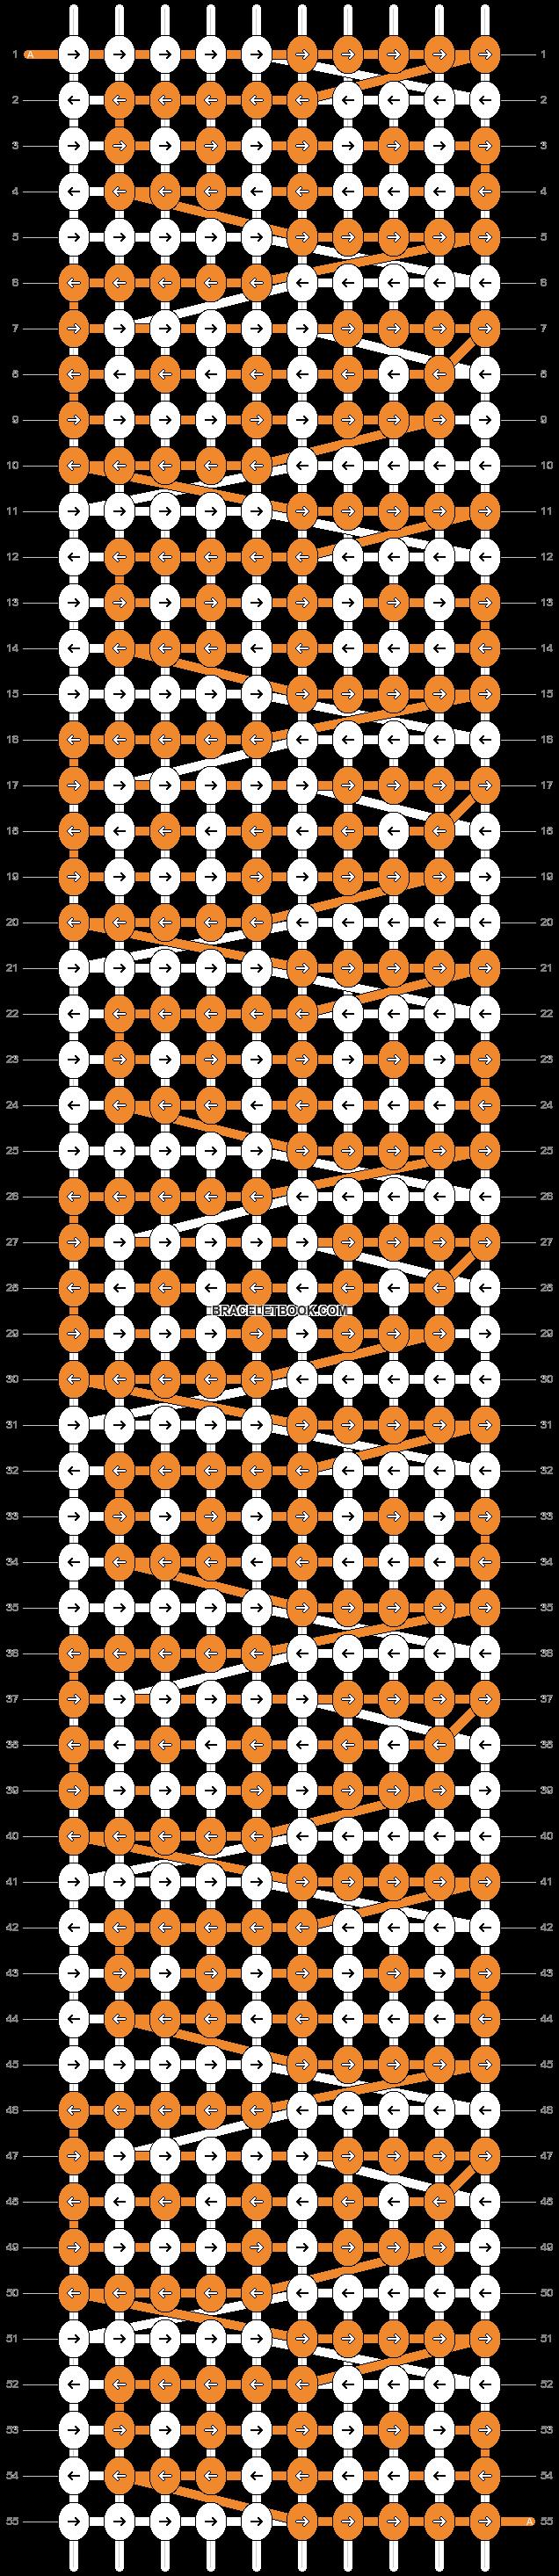 Alpha pattern #25051 pattern